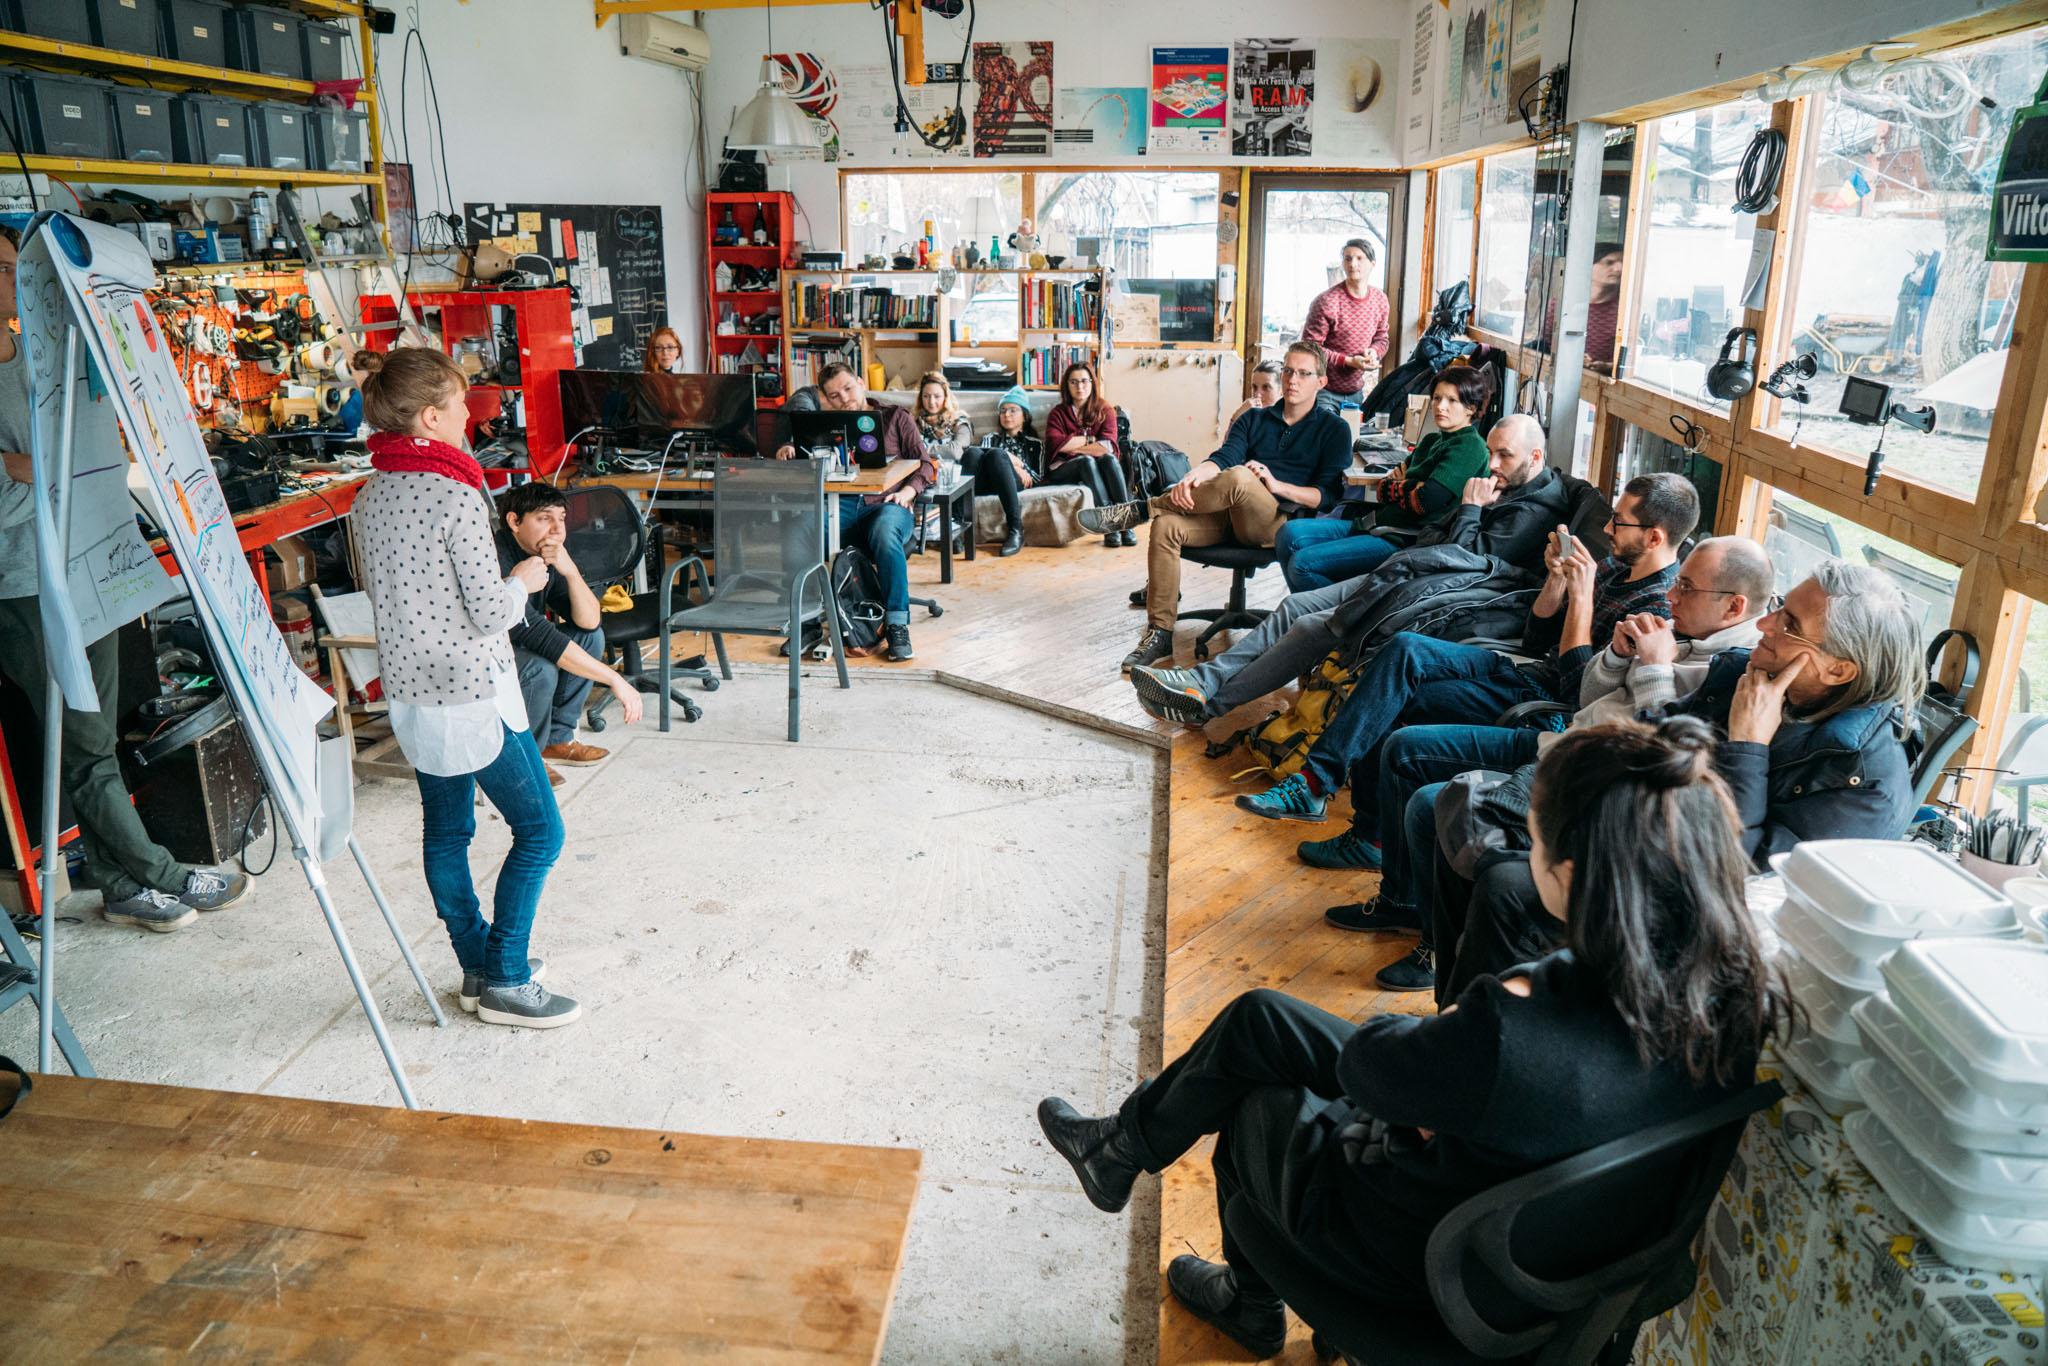 Last December's digital workshop saw participants brainstorm solutions for improving human-bison co-existence.